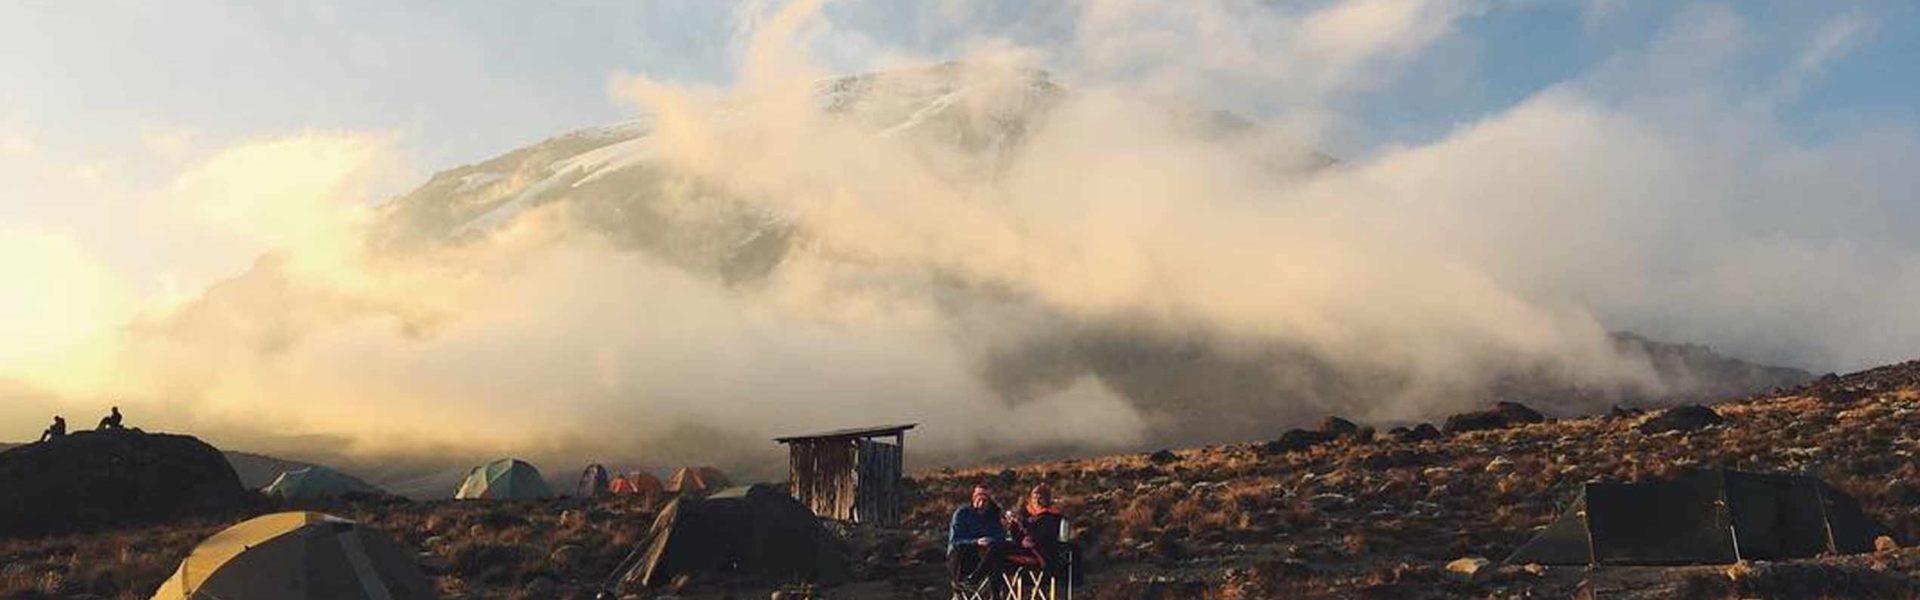 Top 20 FAQ on Mount Kilimanjaro trekking